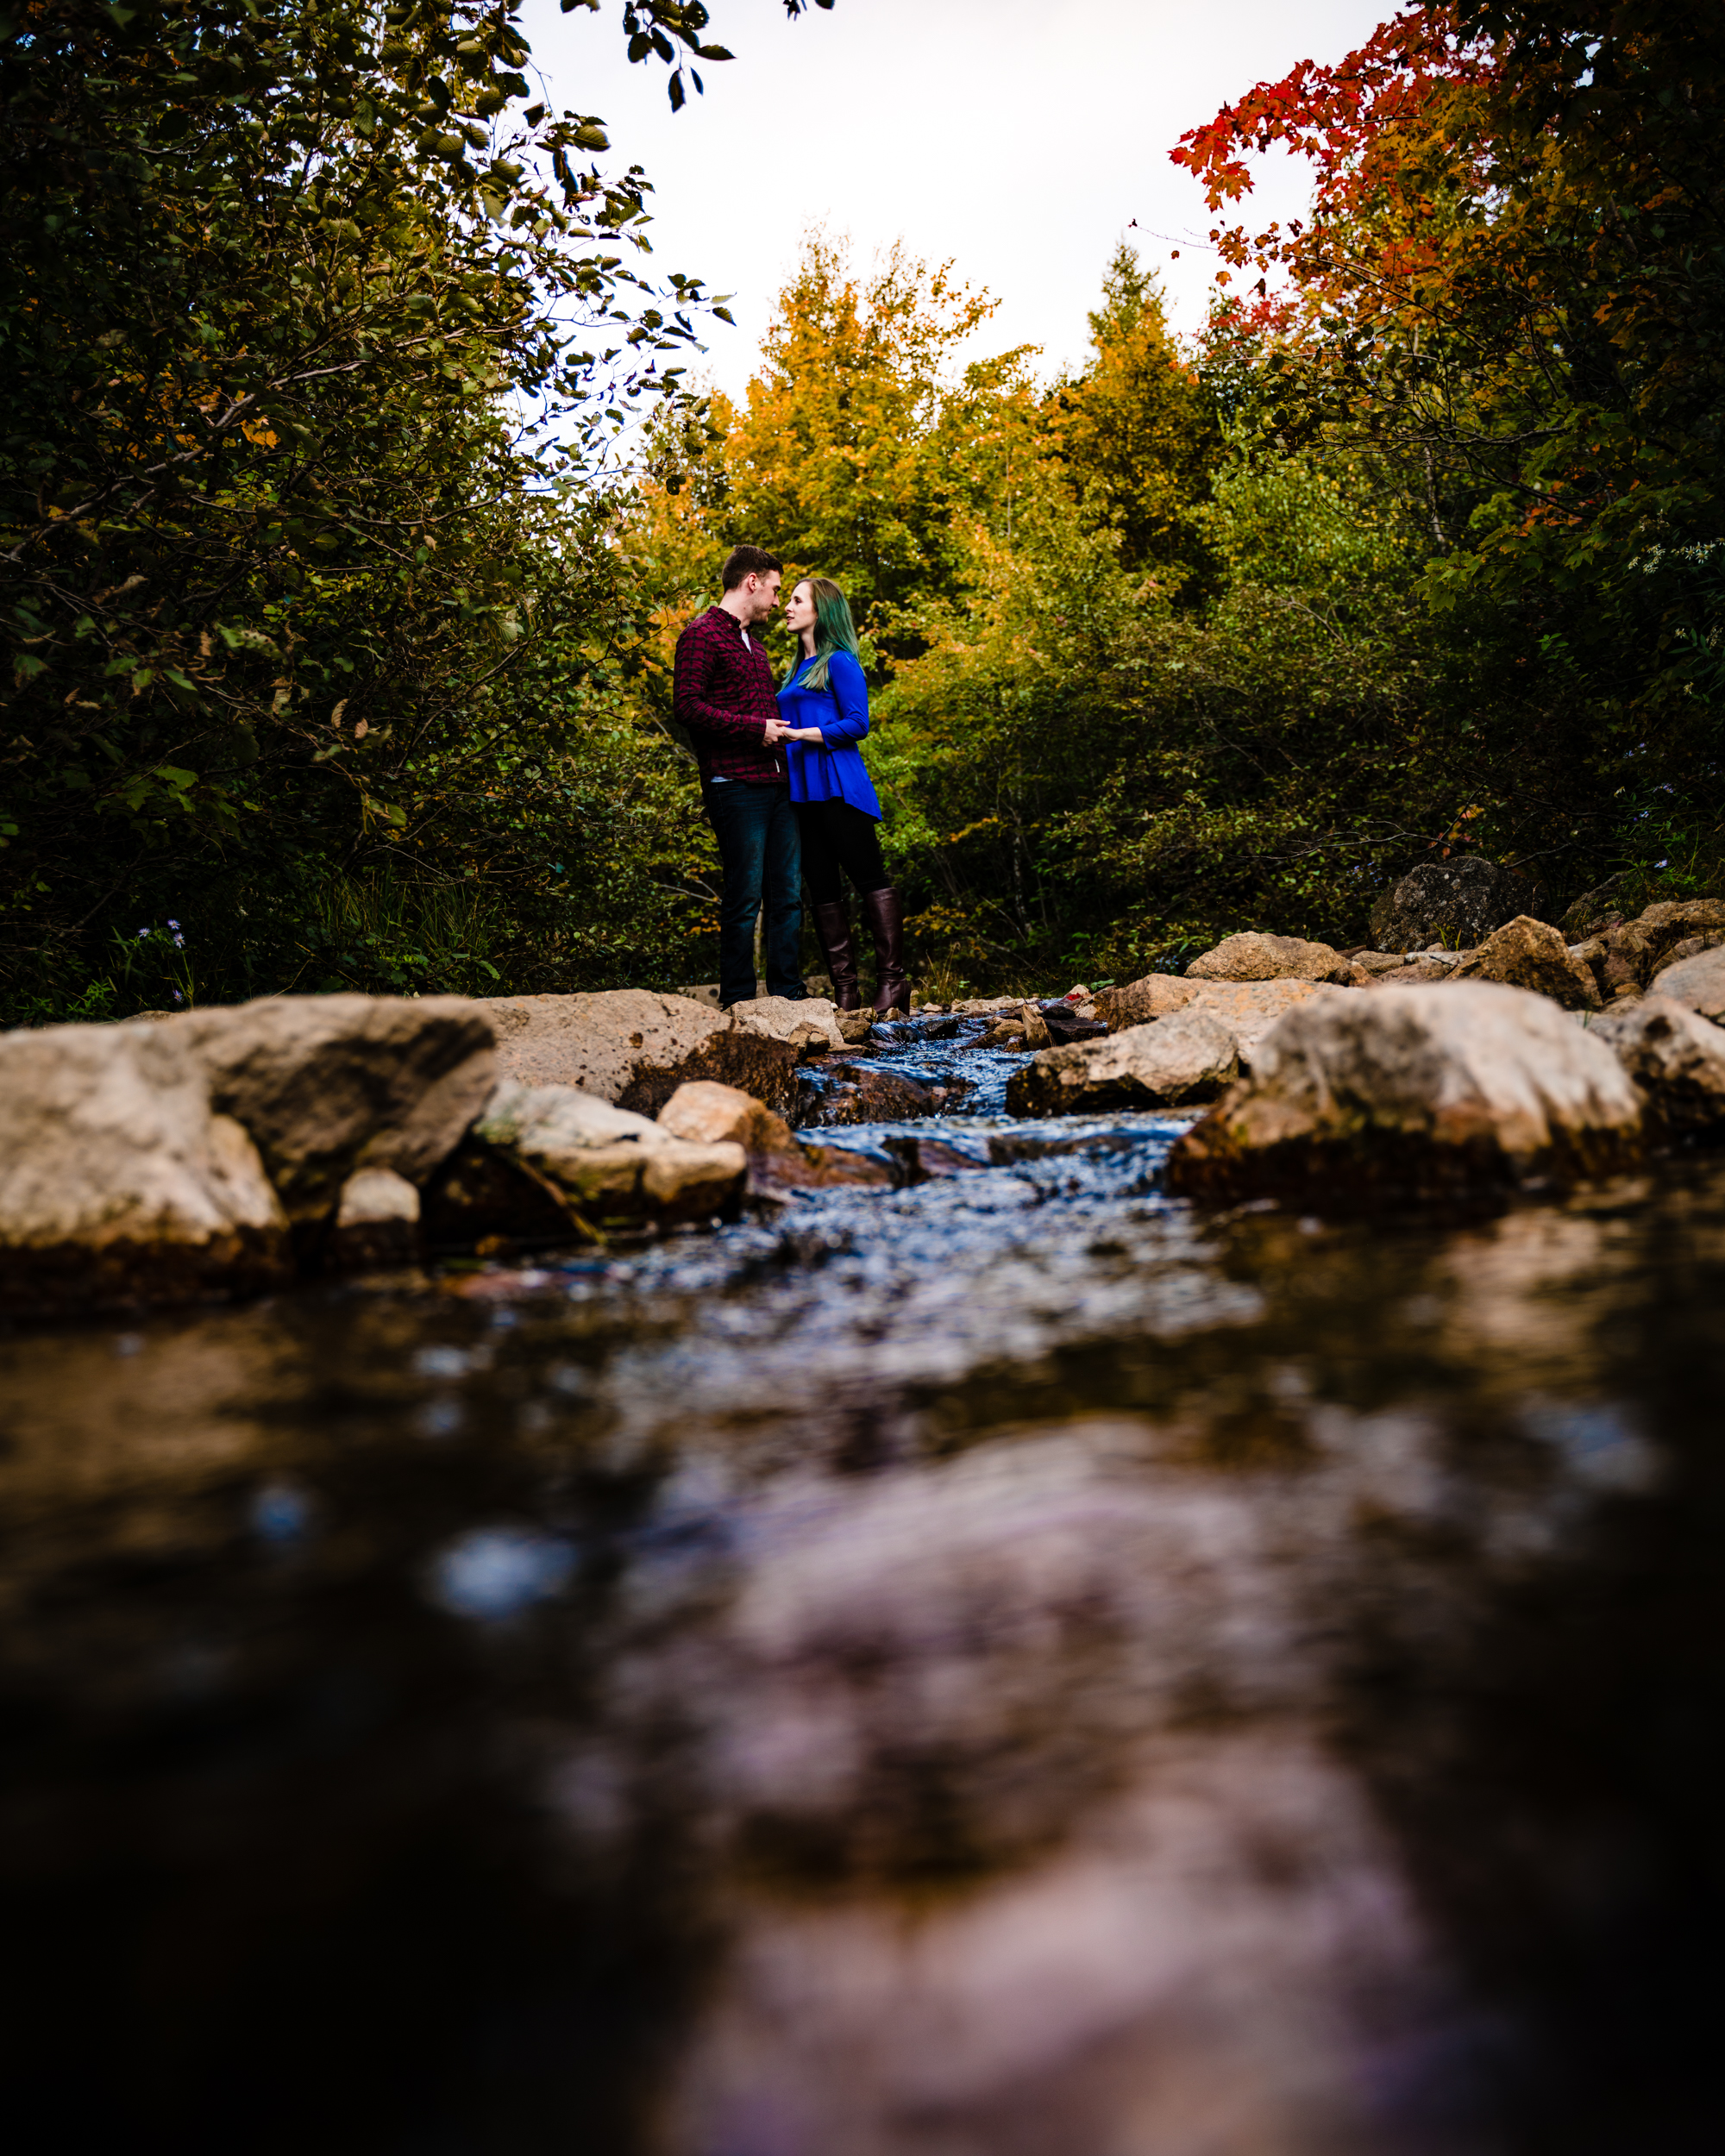 Halifax-engagement-nova-scotia-ottawa-ontario-arcade-longlake-Fall-Autumn (11 of 60).jpg